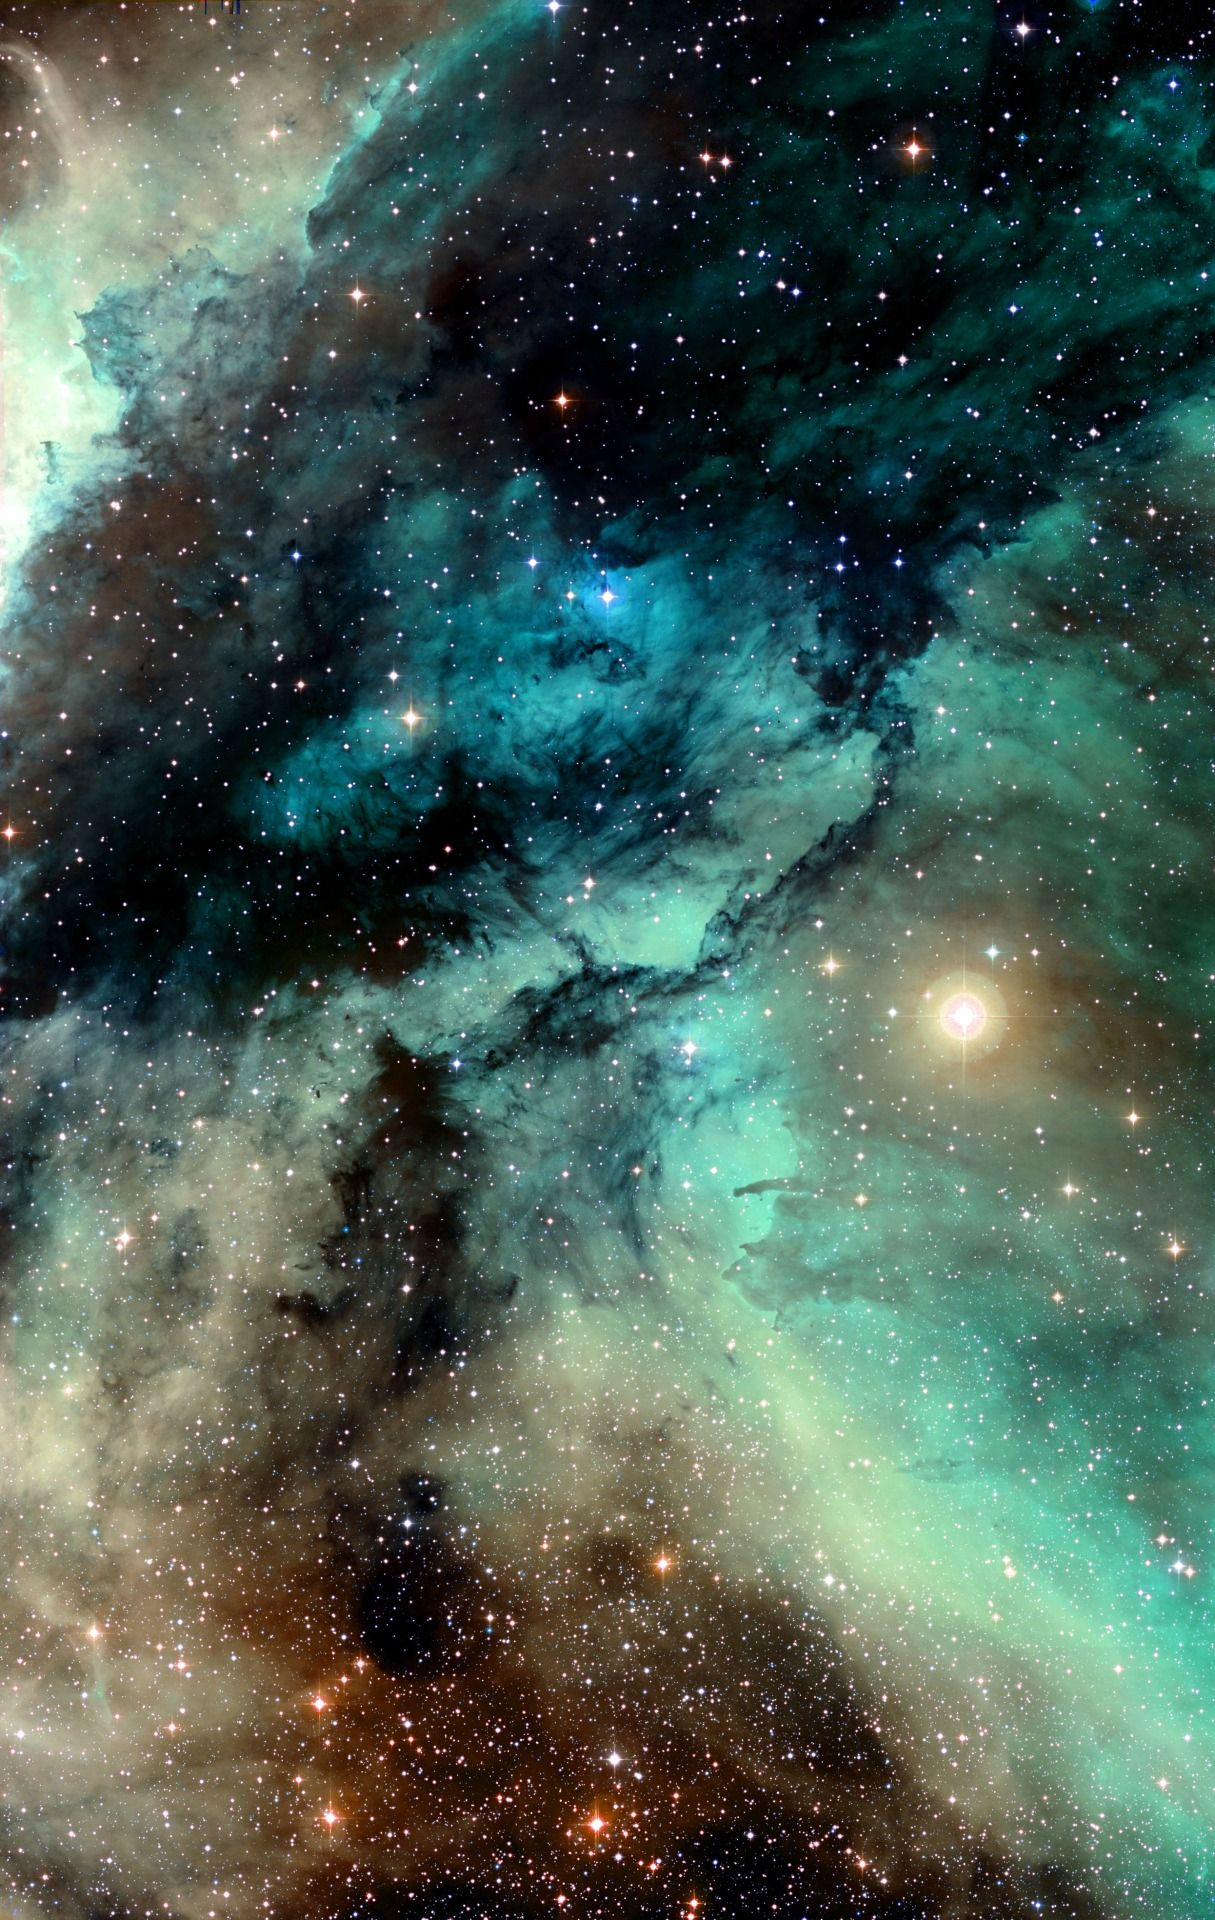 carina nebula ice sculptures - photo #10